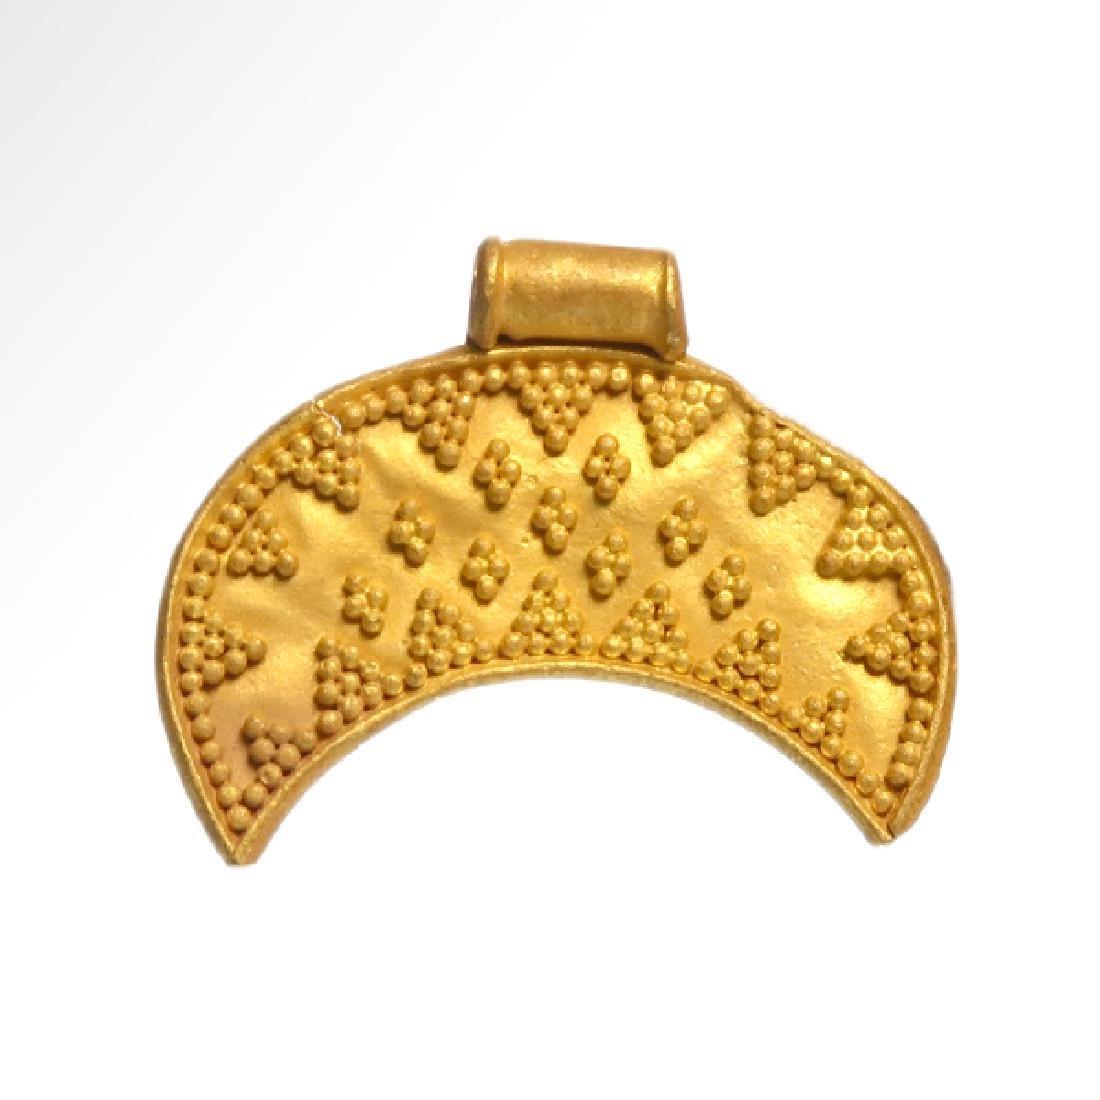 Viking Gold Lunar Pendant, c. 10th Century A.D.